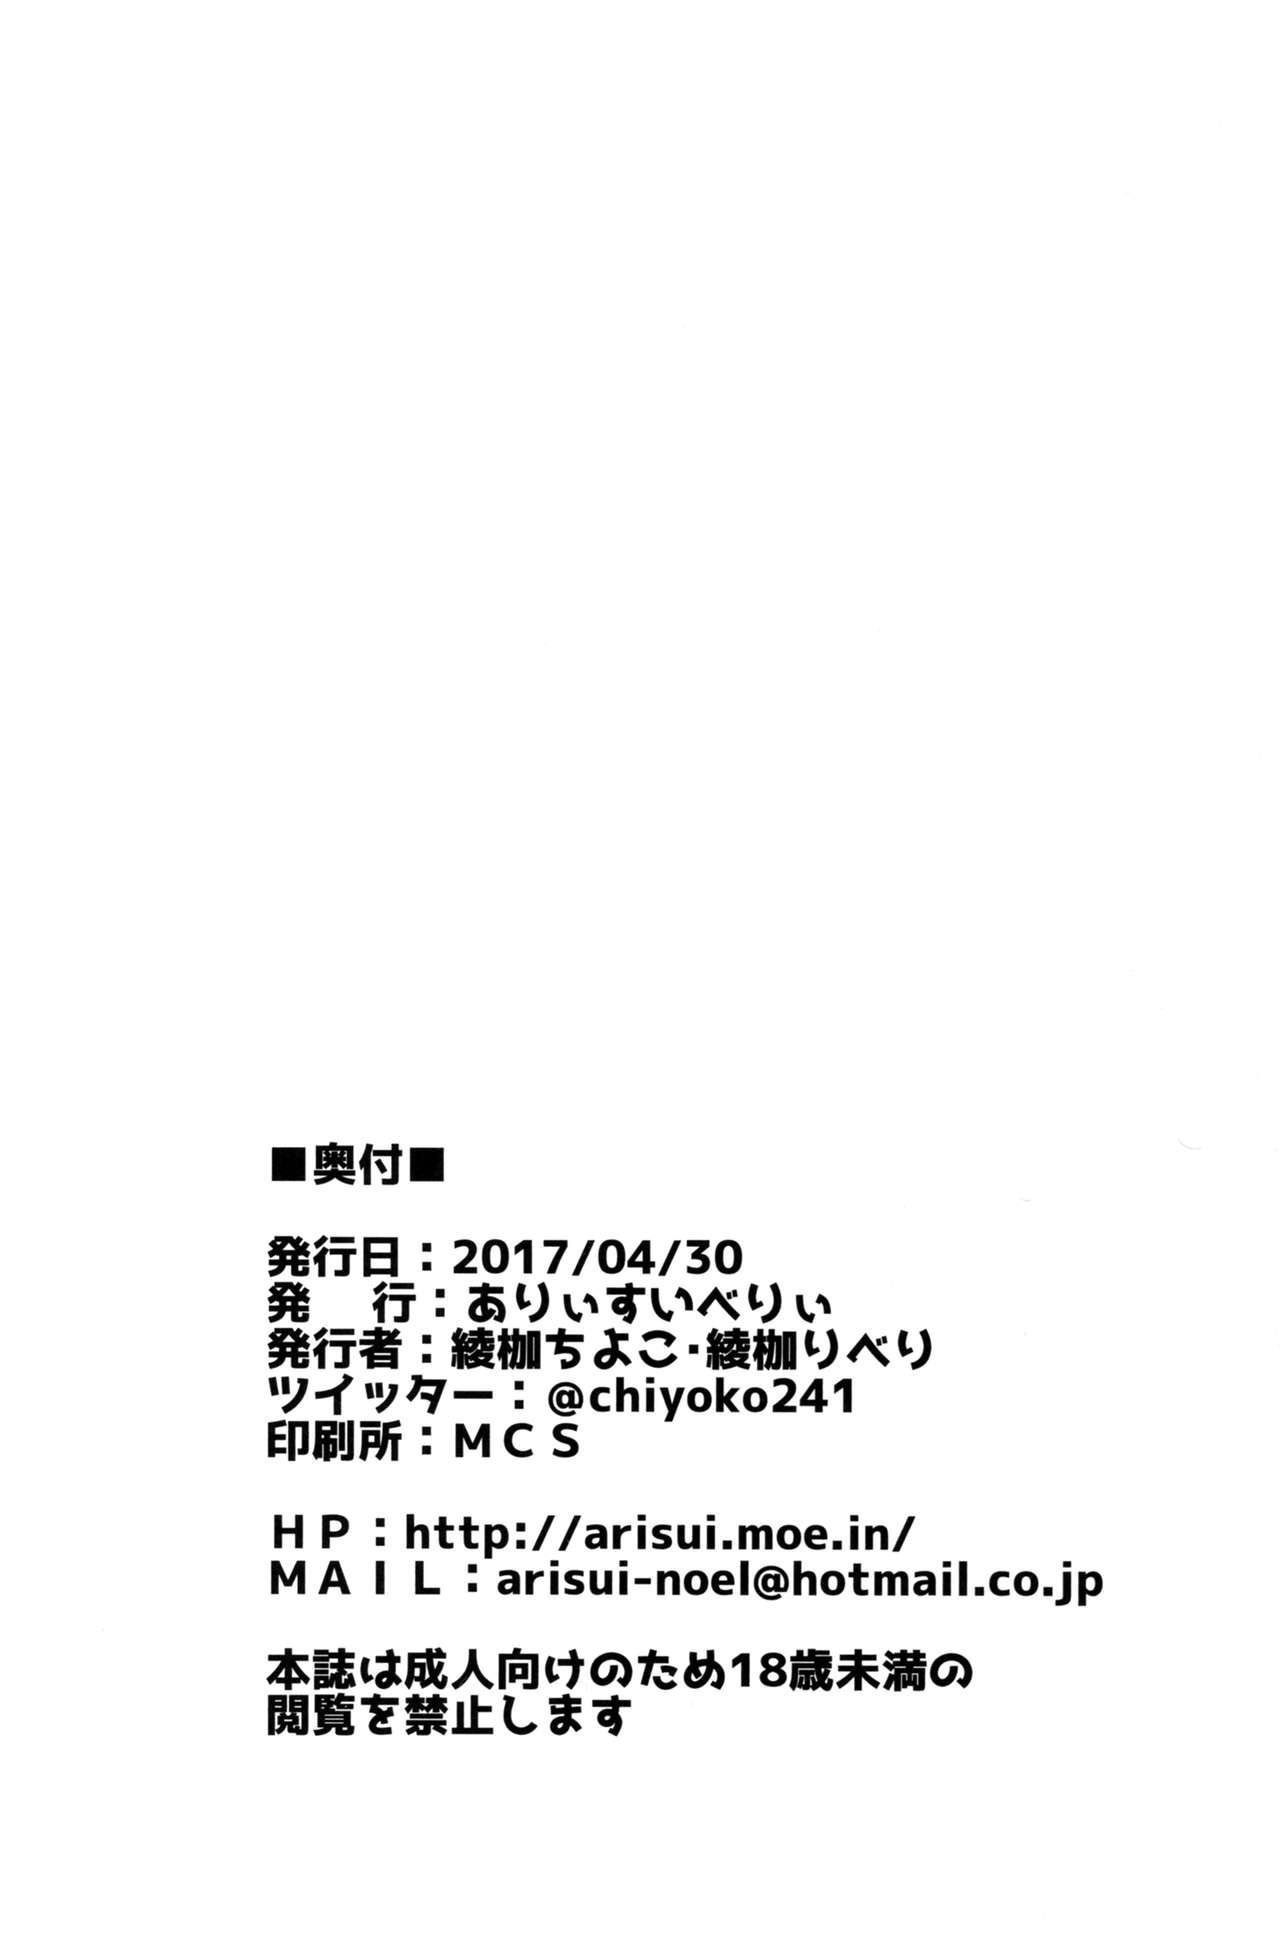 (COMIC1☆11) [Arysuivery (Ayakase Chiyoko, Ayakase Riberi)] Danchou-chan Danchou-chan 4 (Granblue Fantasy) 25